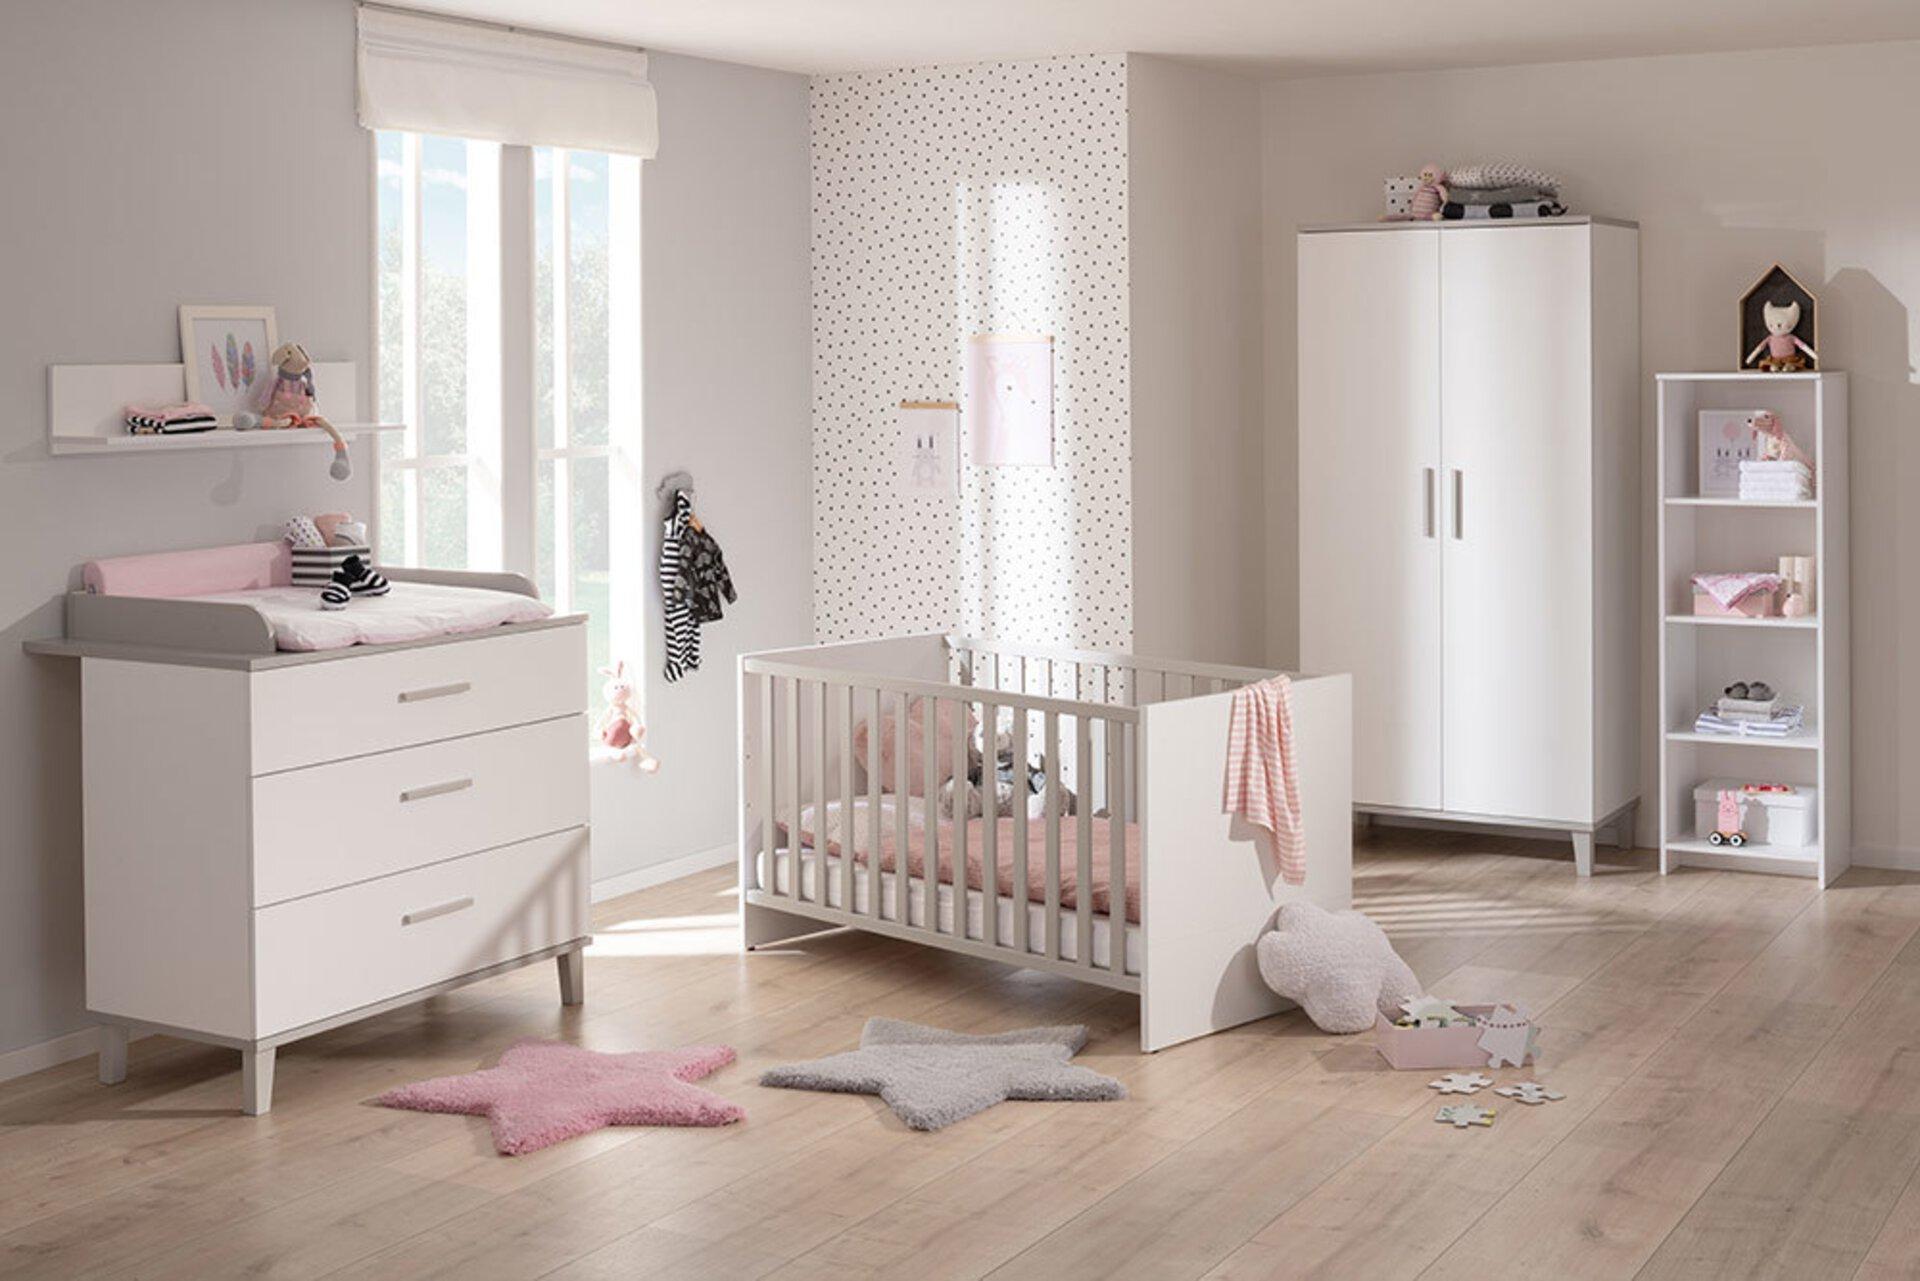 Kinderbett NILS inbuy Holzwerkstoff 144 x 79 x 77 cm